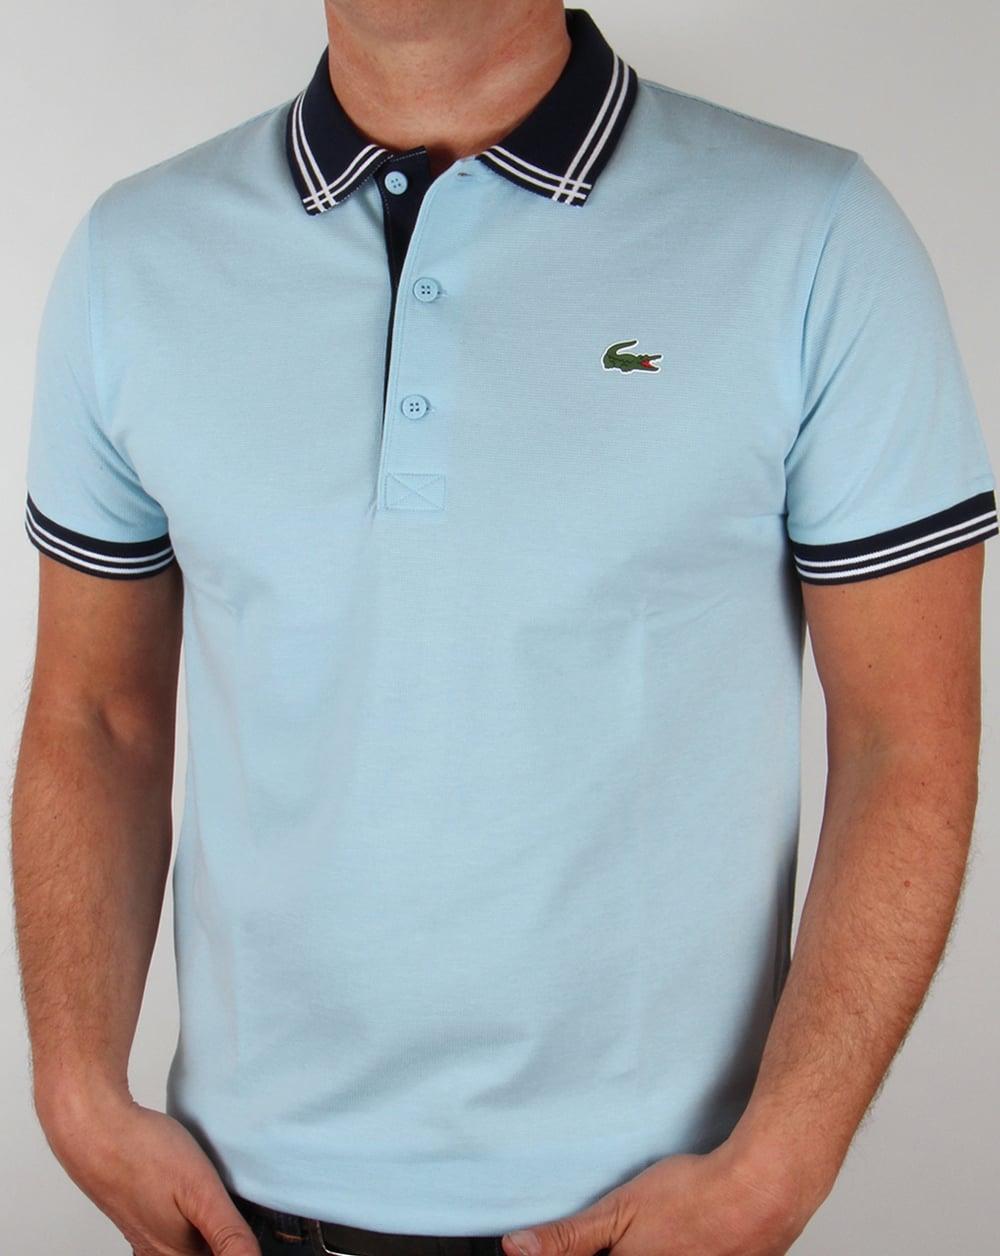 lacoste piping collar golf polo shirt sky blue navy mens